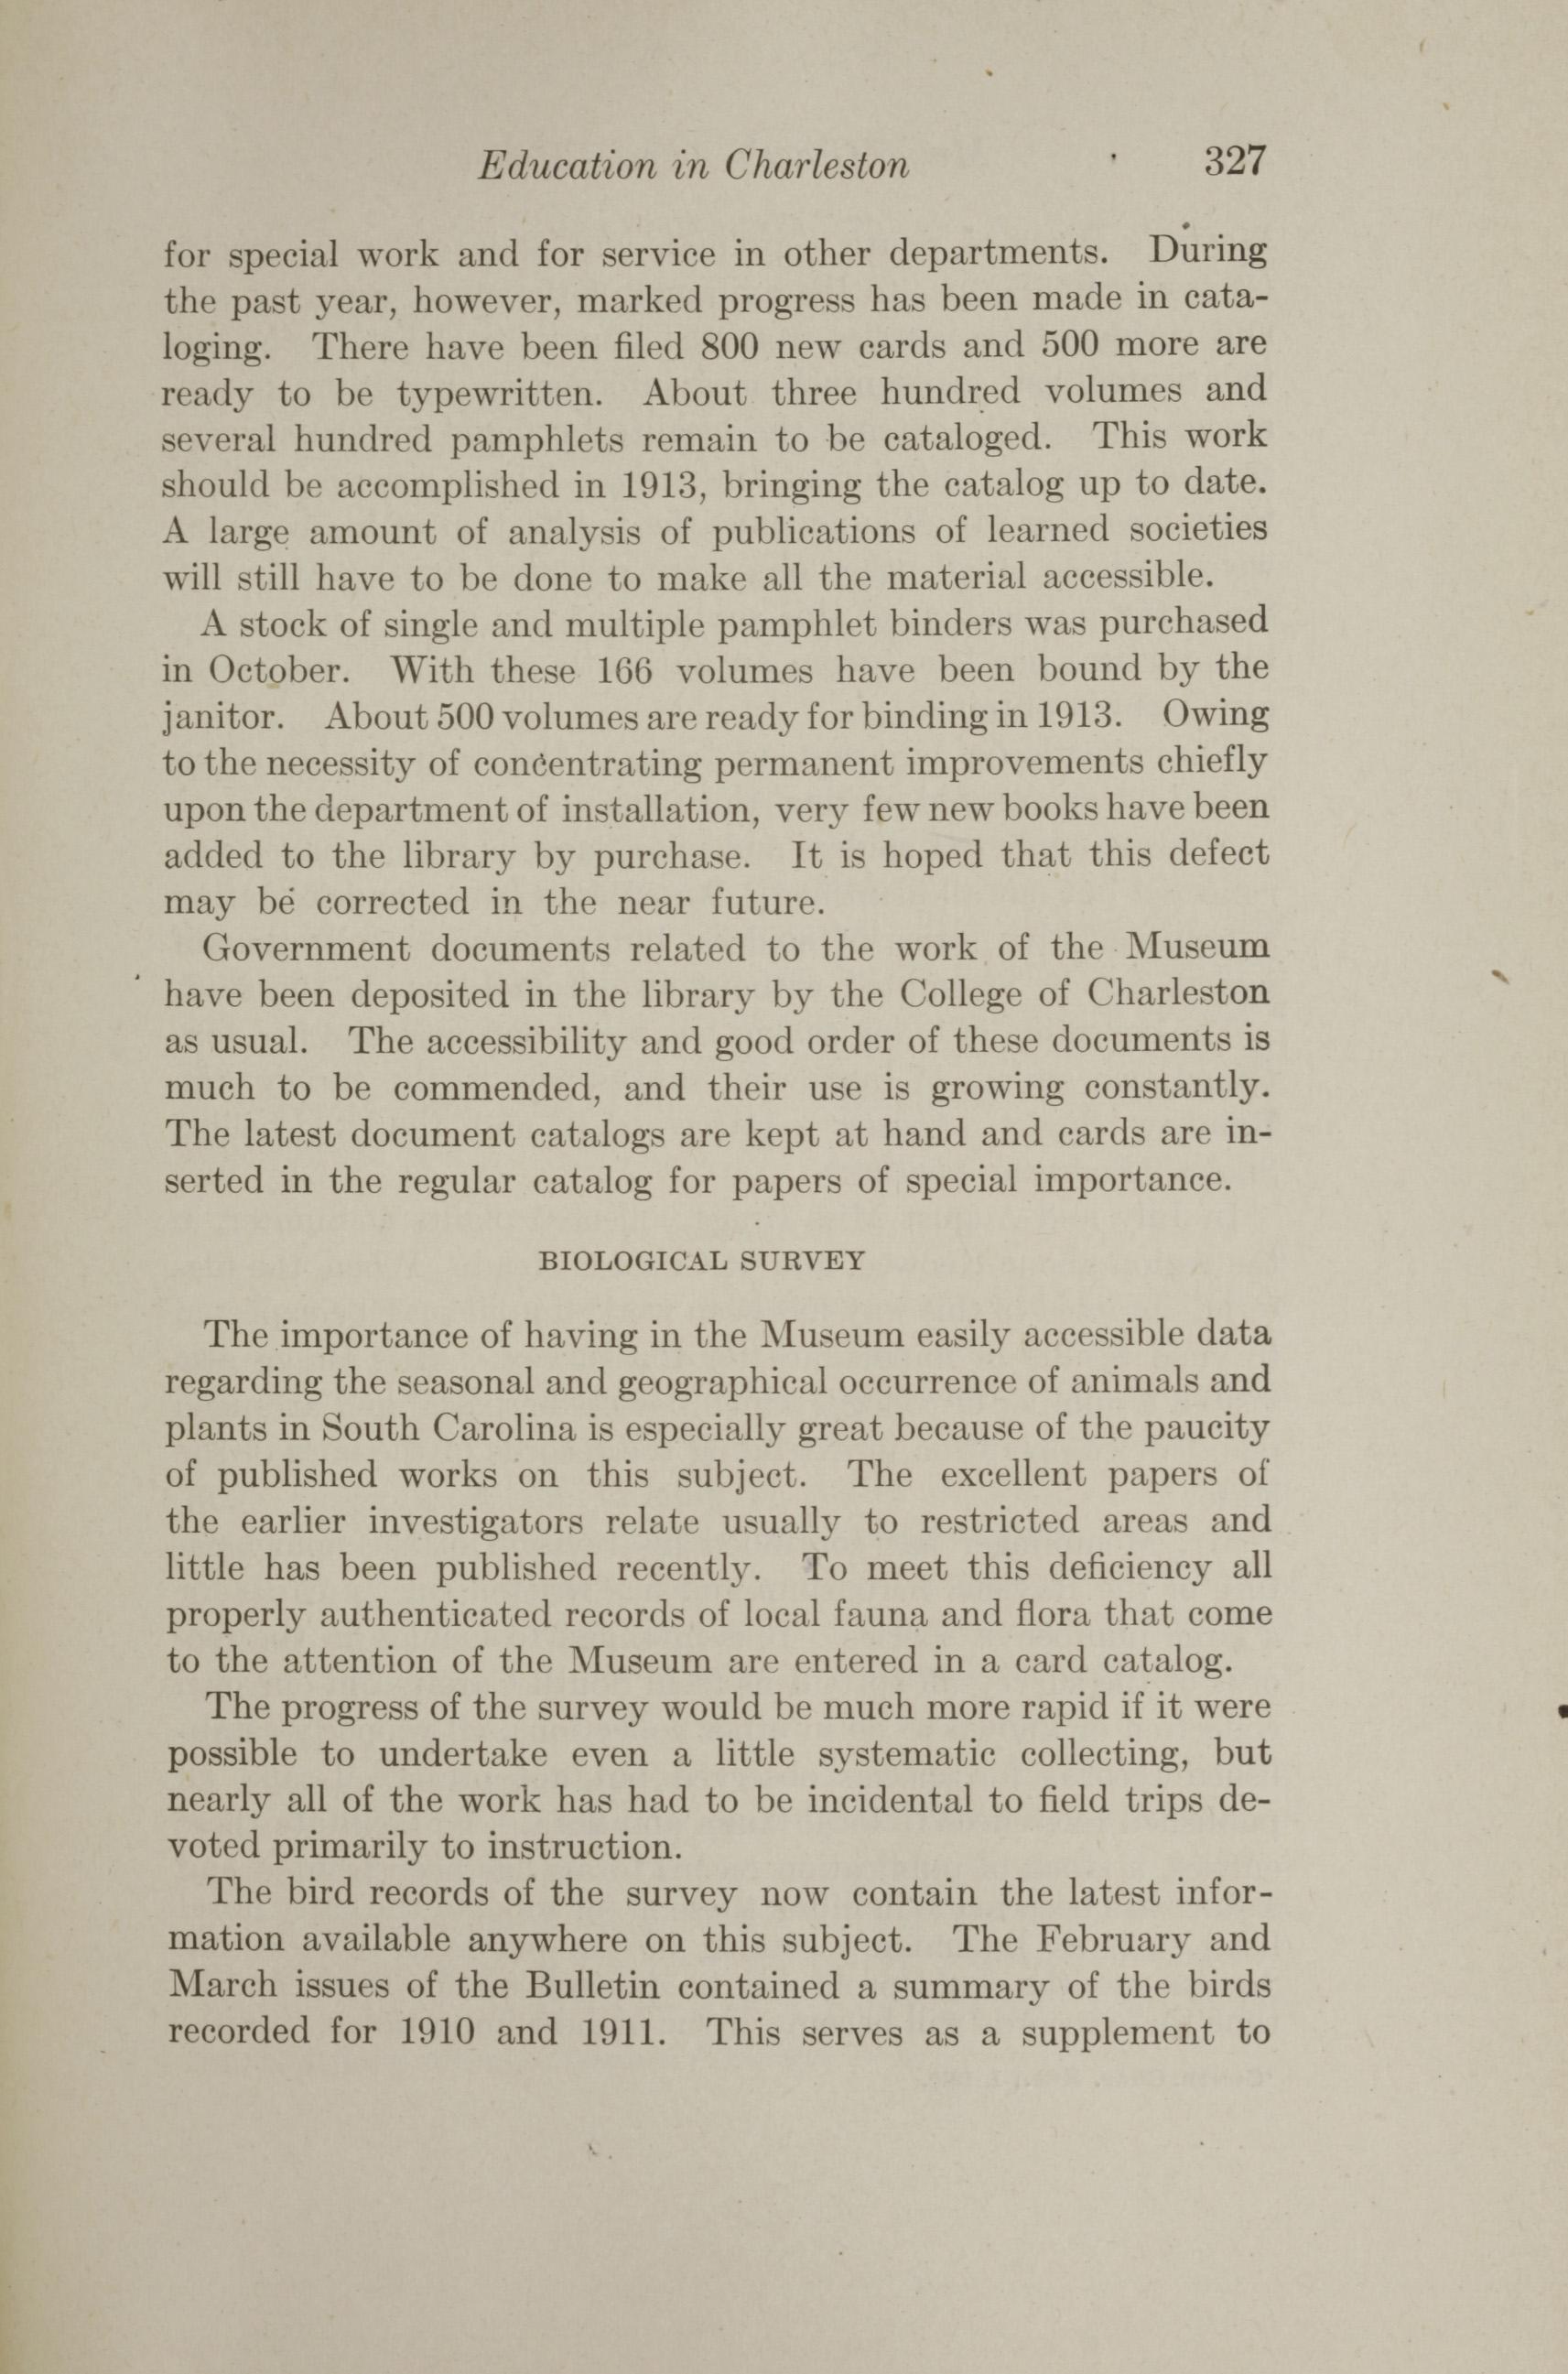 Charleston Yearbook, 1912, page 327